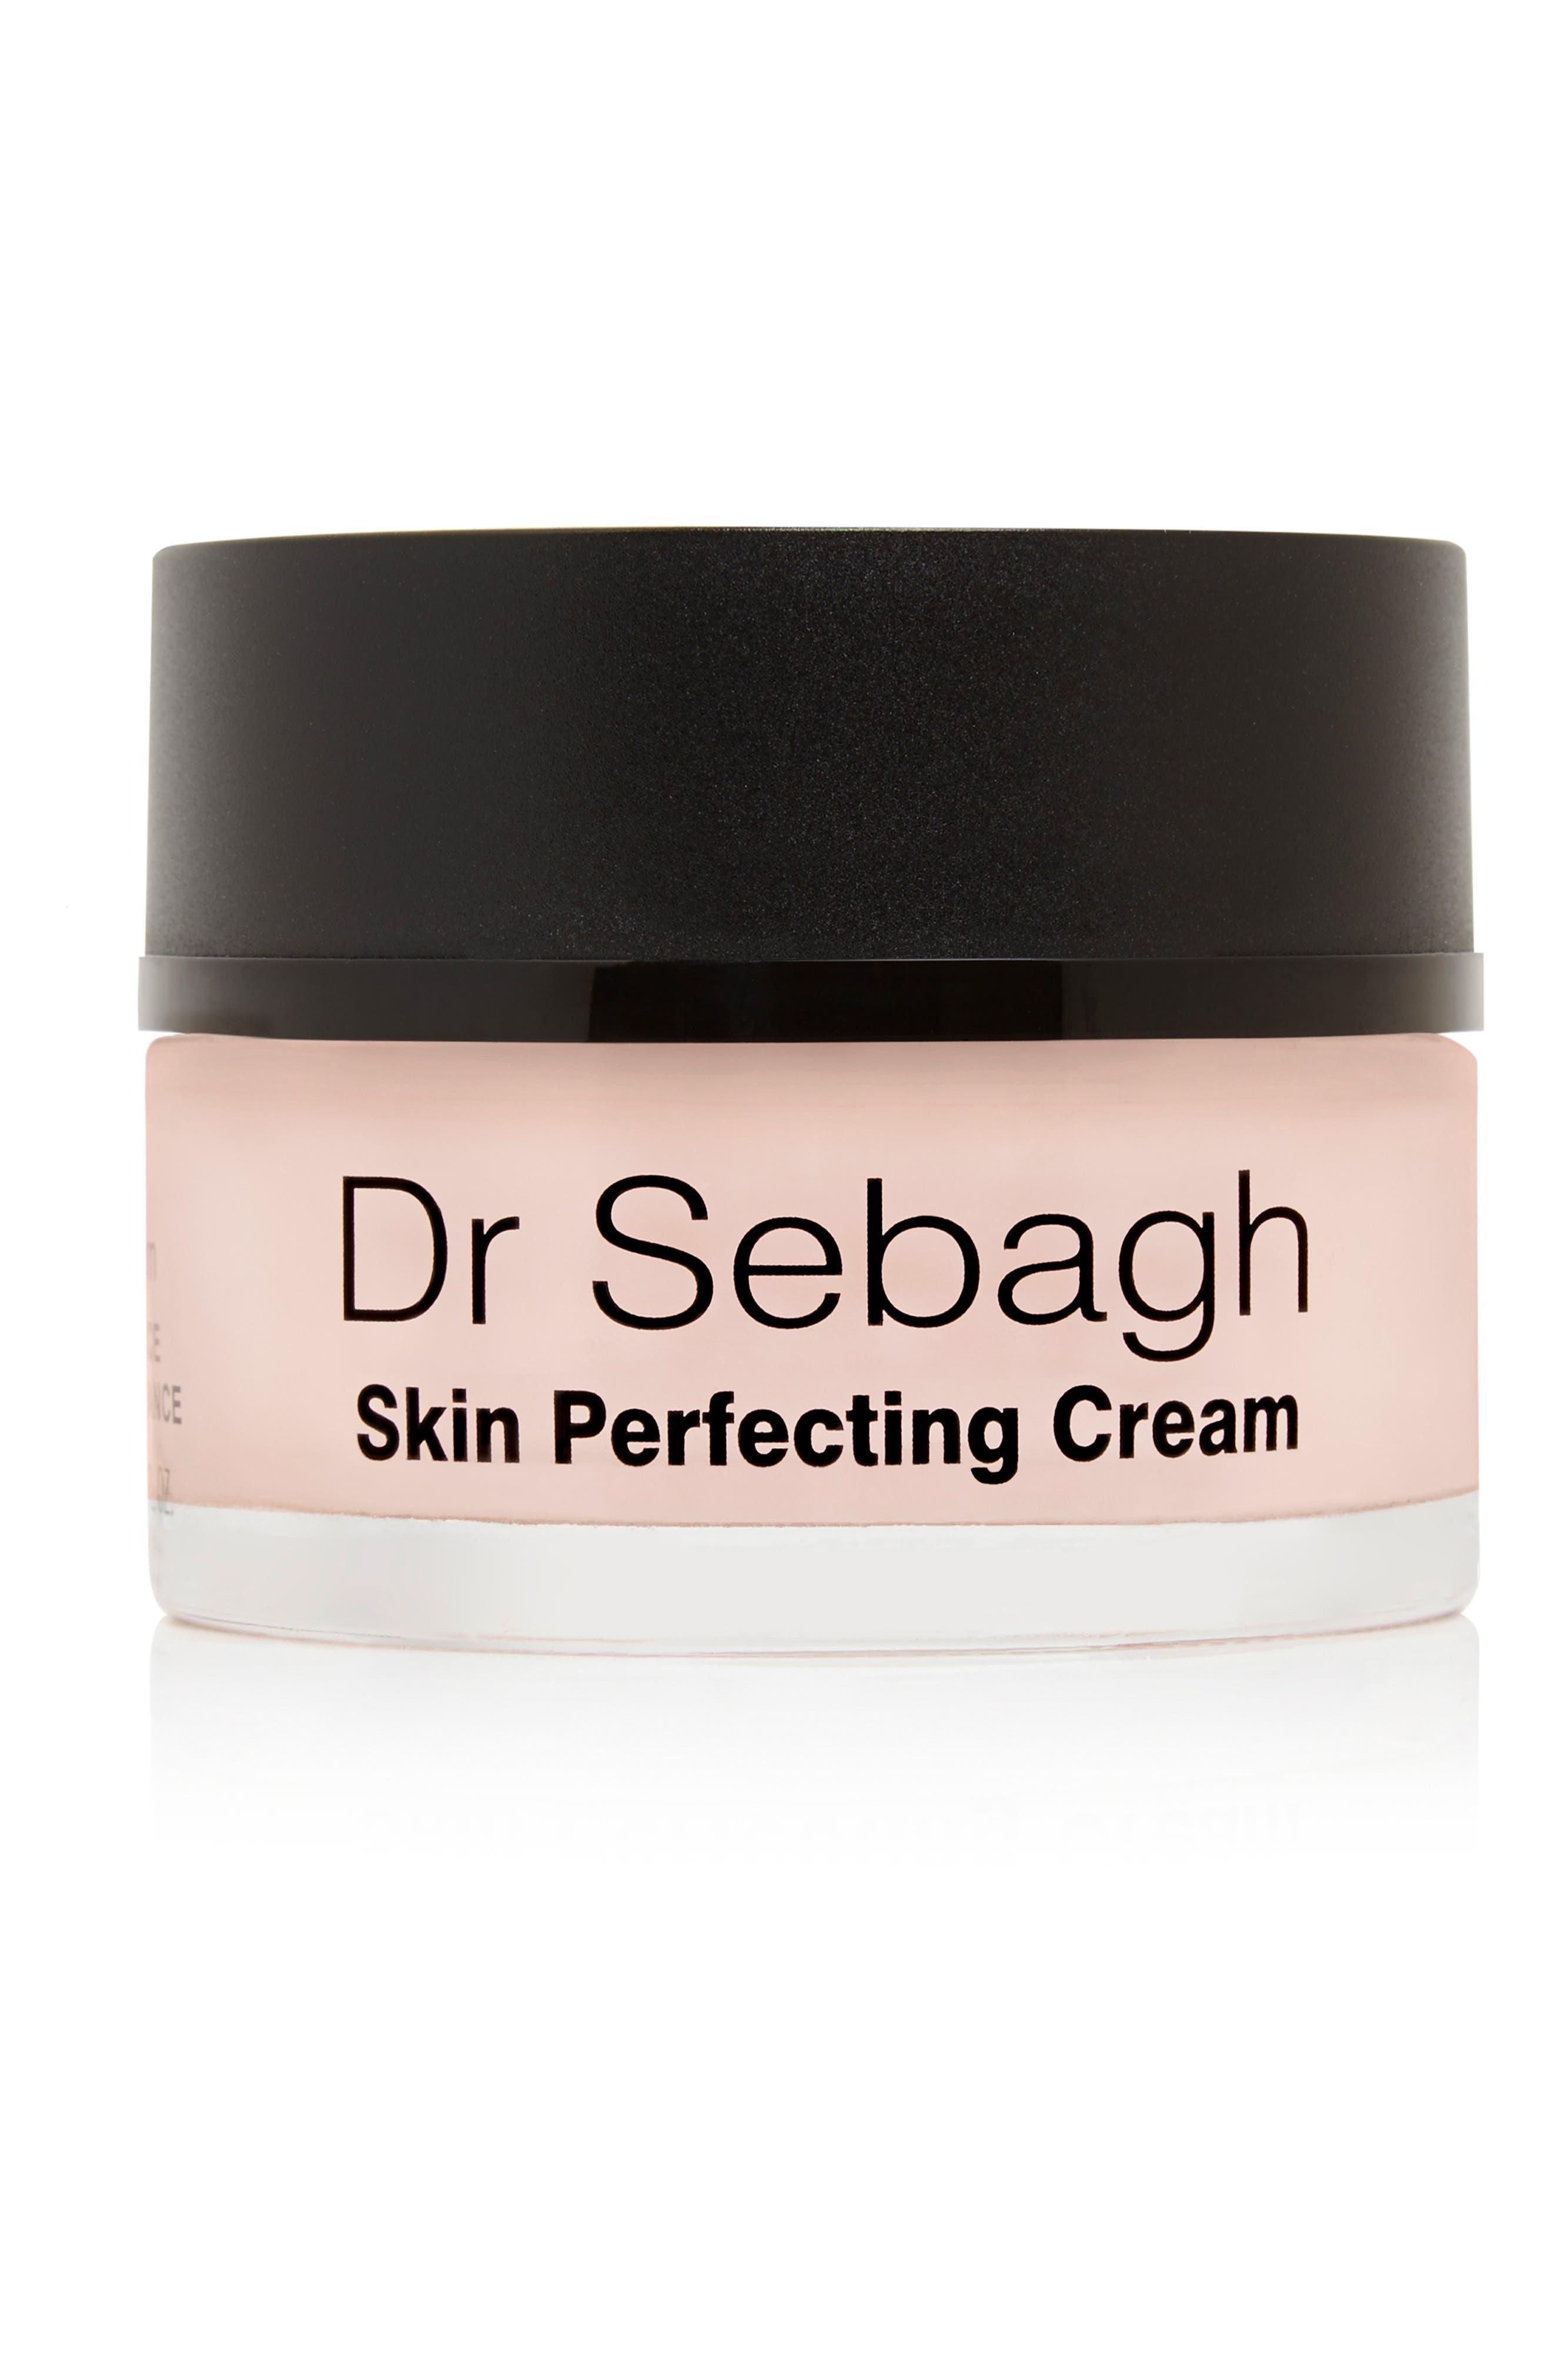 Skin Perfecting Cream